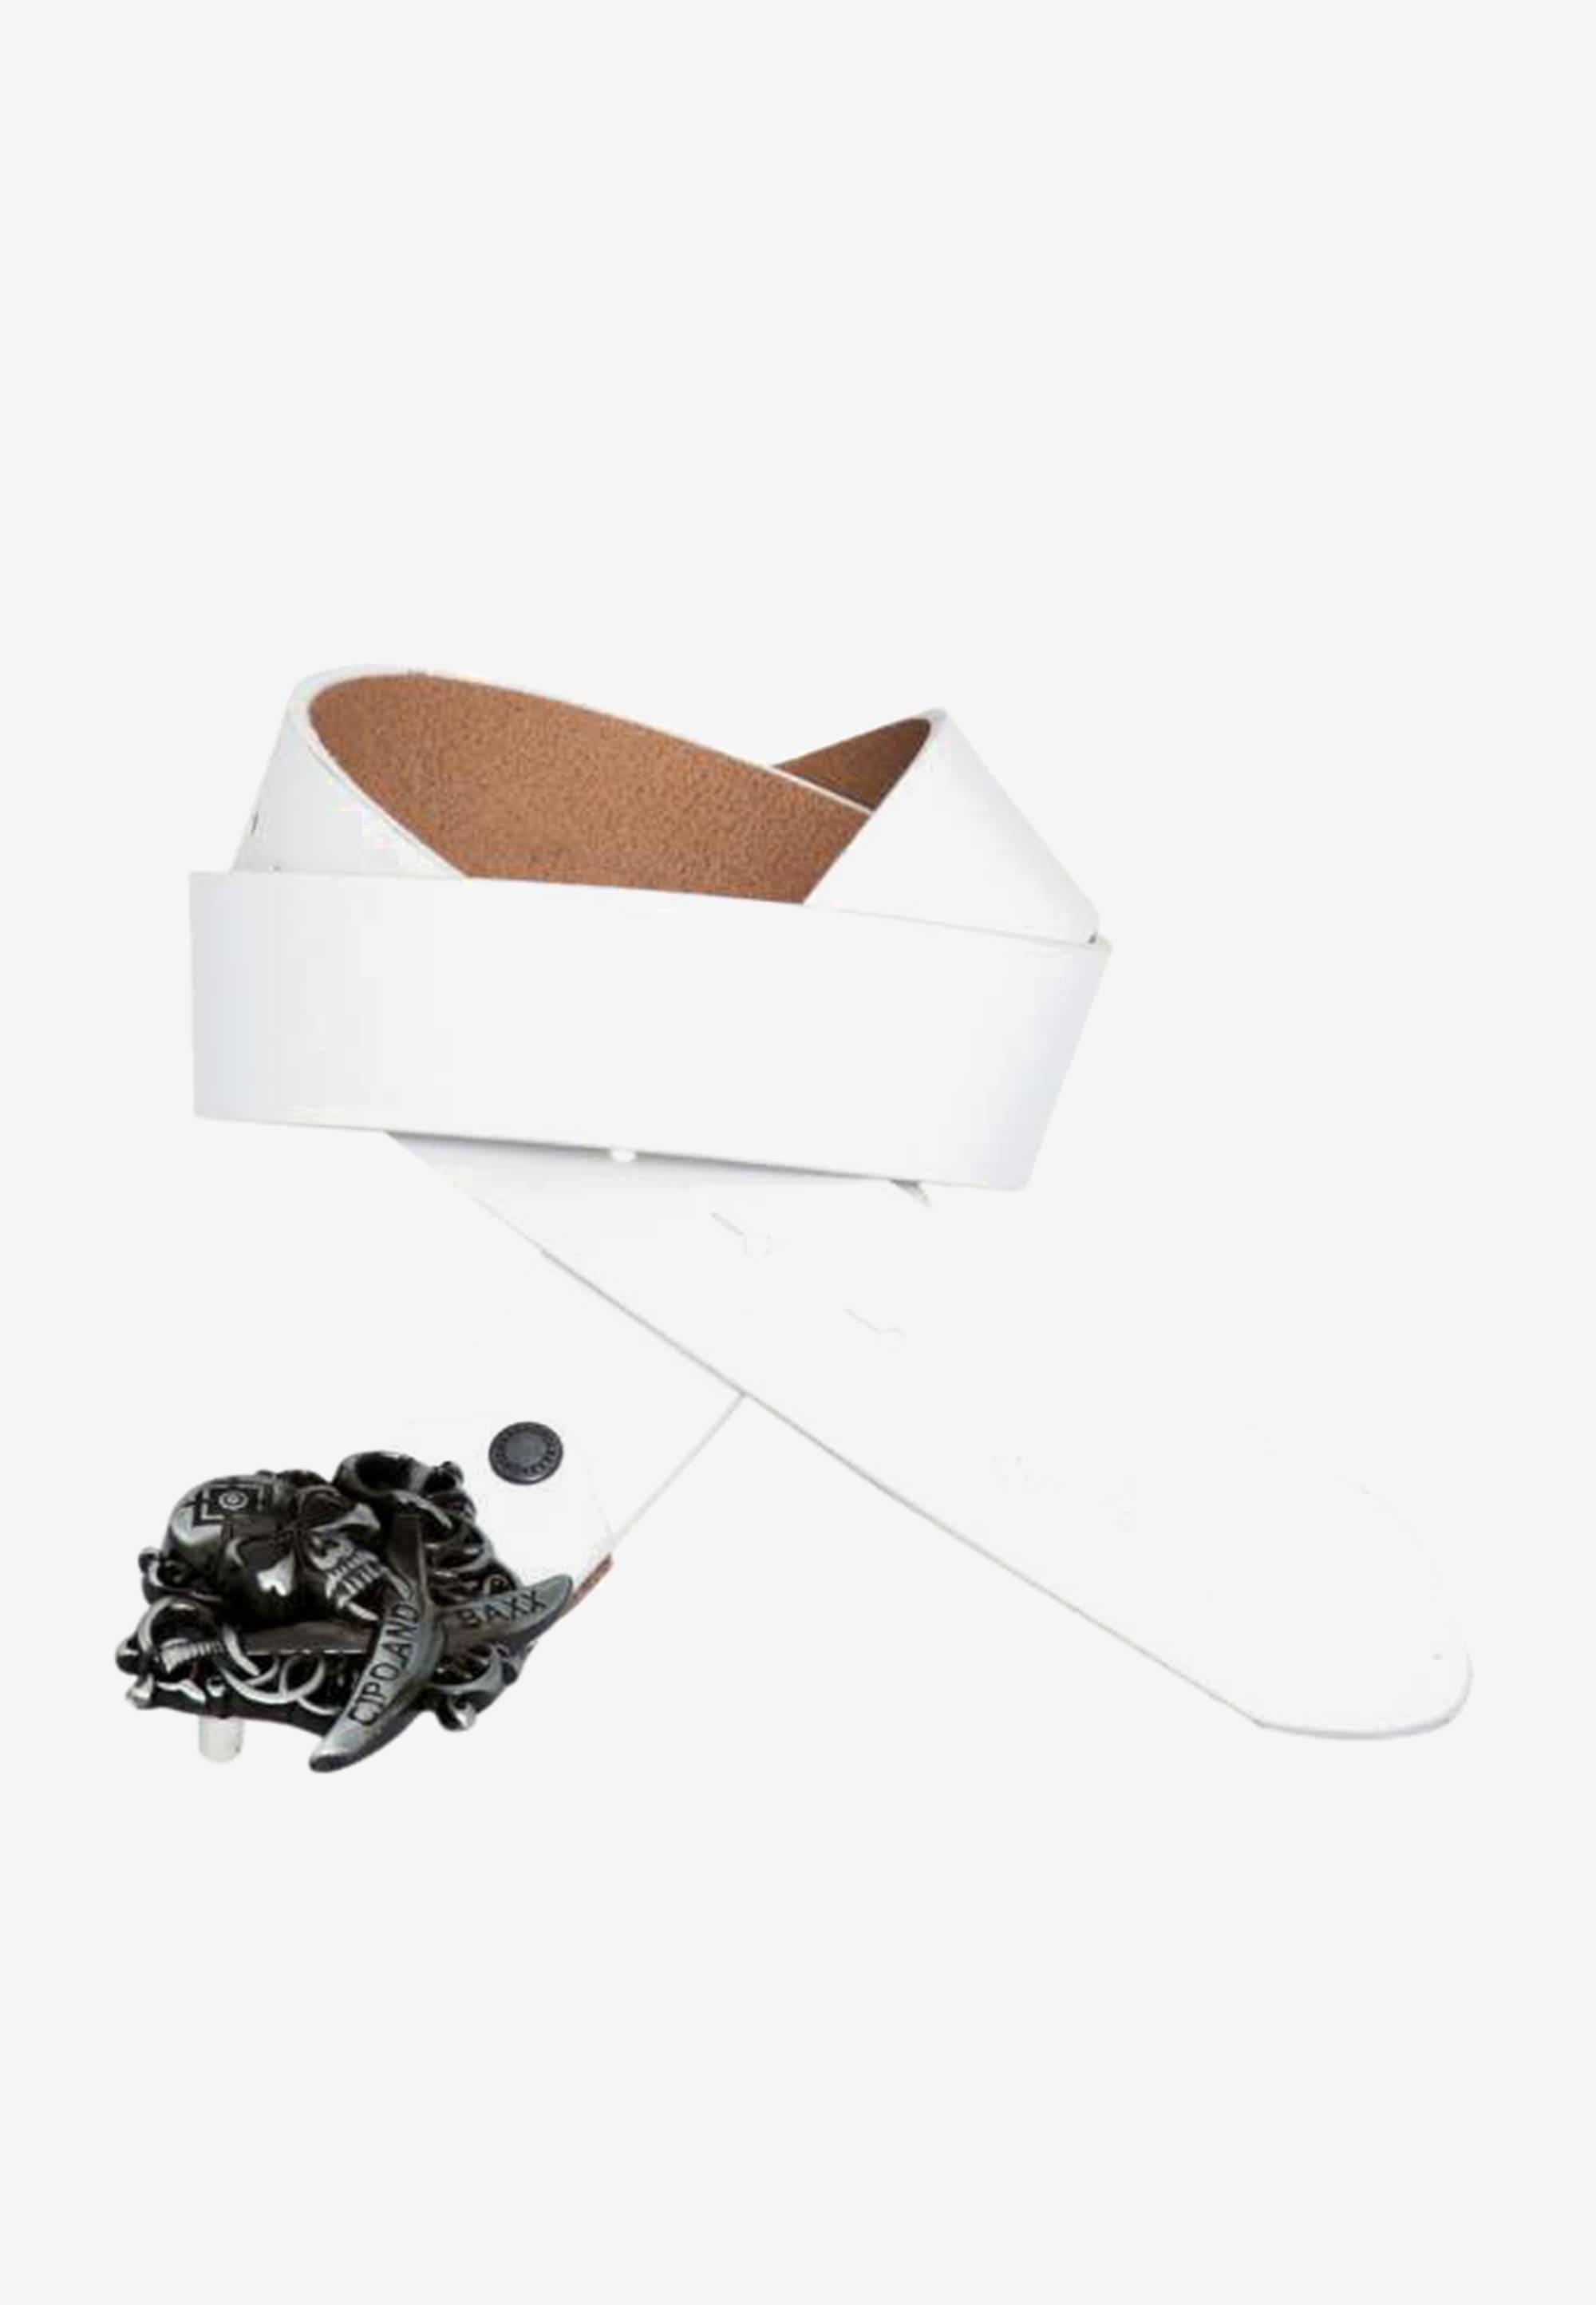 Cipo & Baxx Ledergürtel, mit cooler Totenkopfschnalle weiß Damen Ledergürtel Gürtel Accessoires 8698819198296